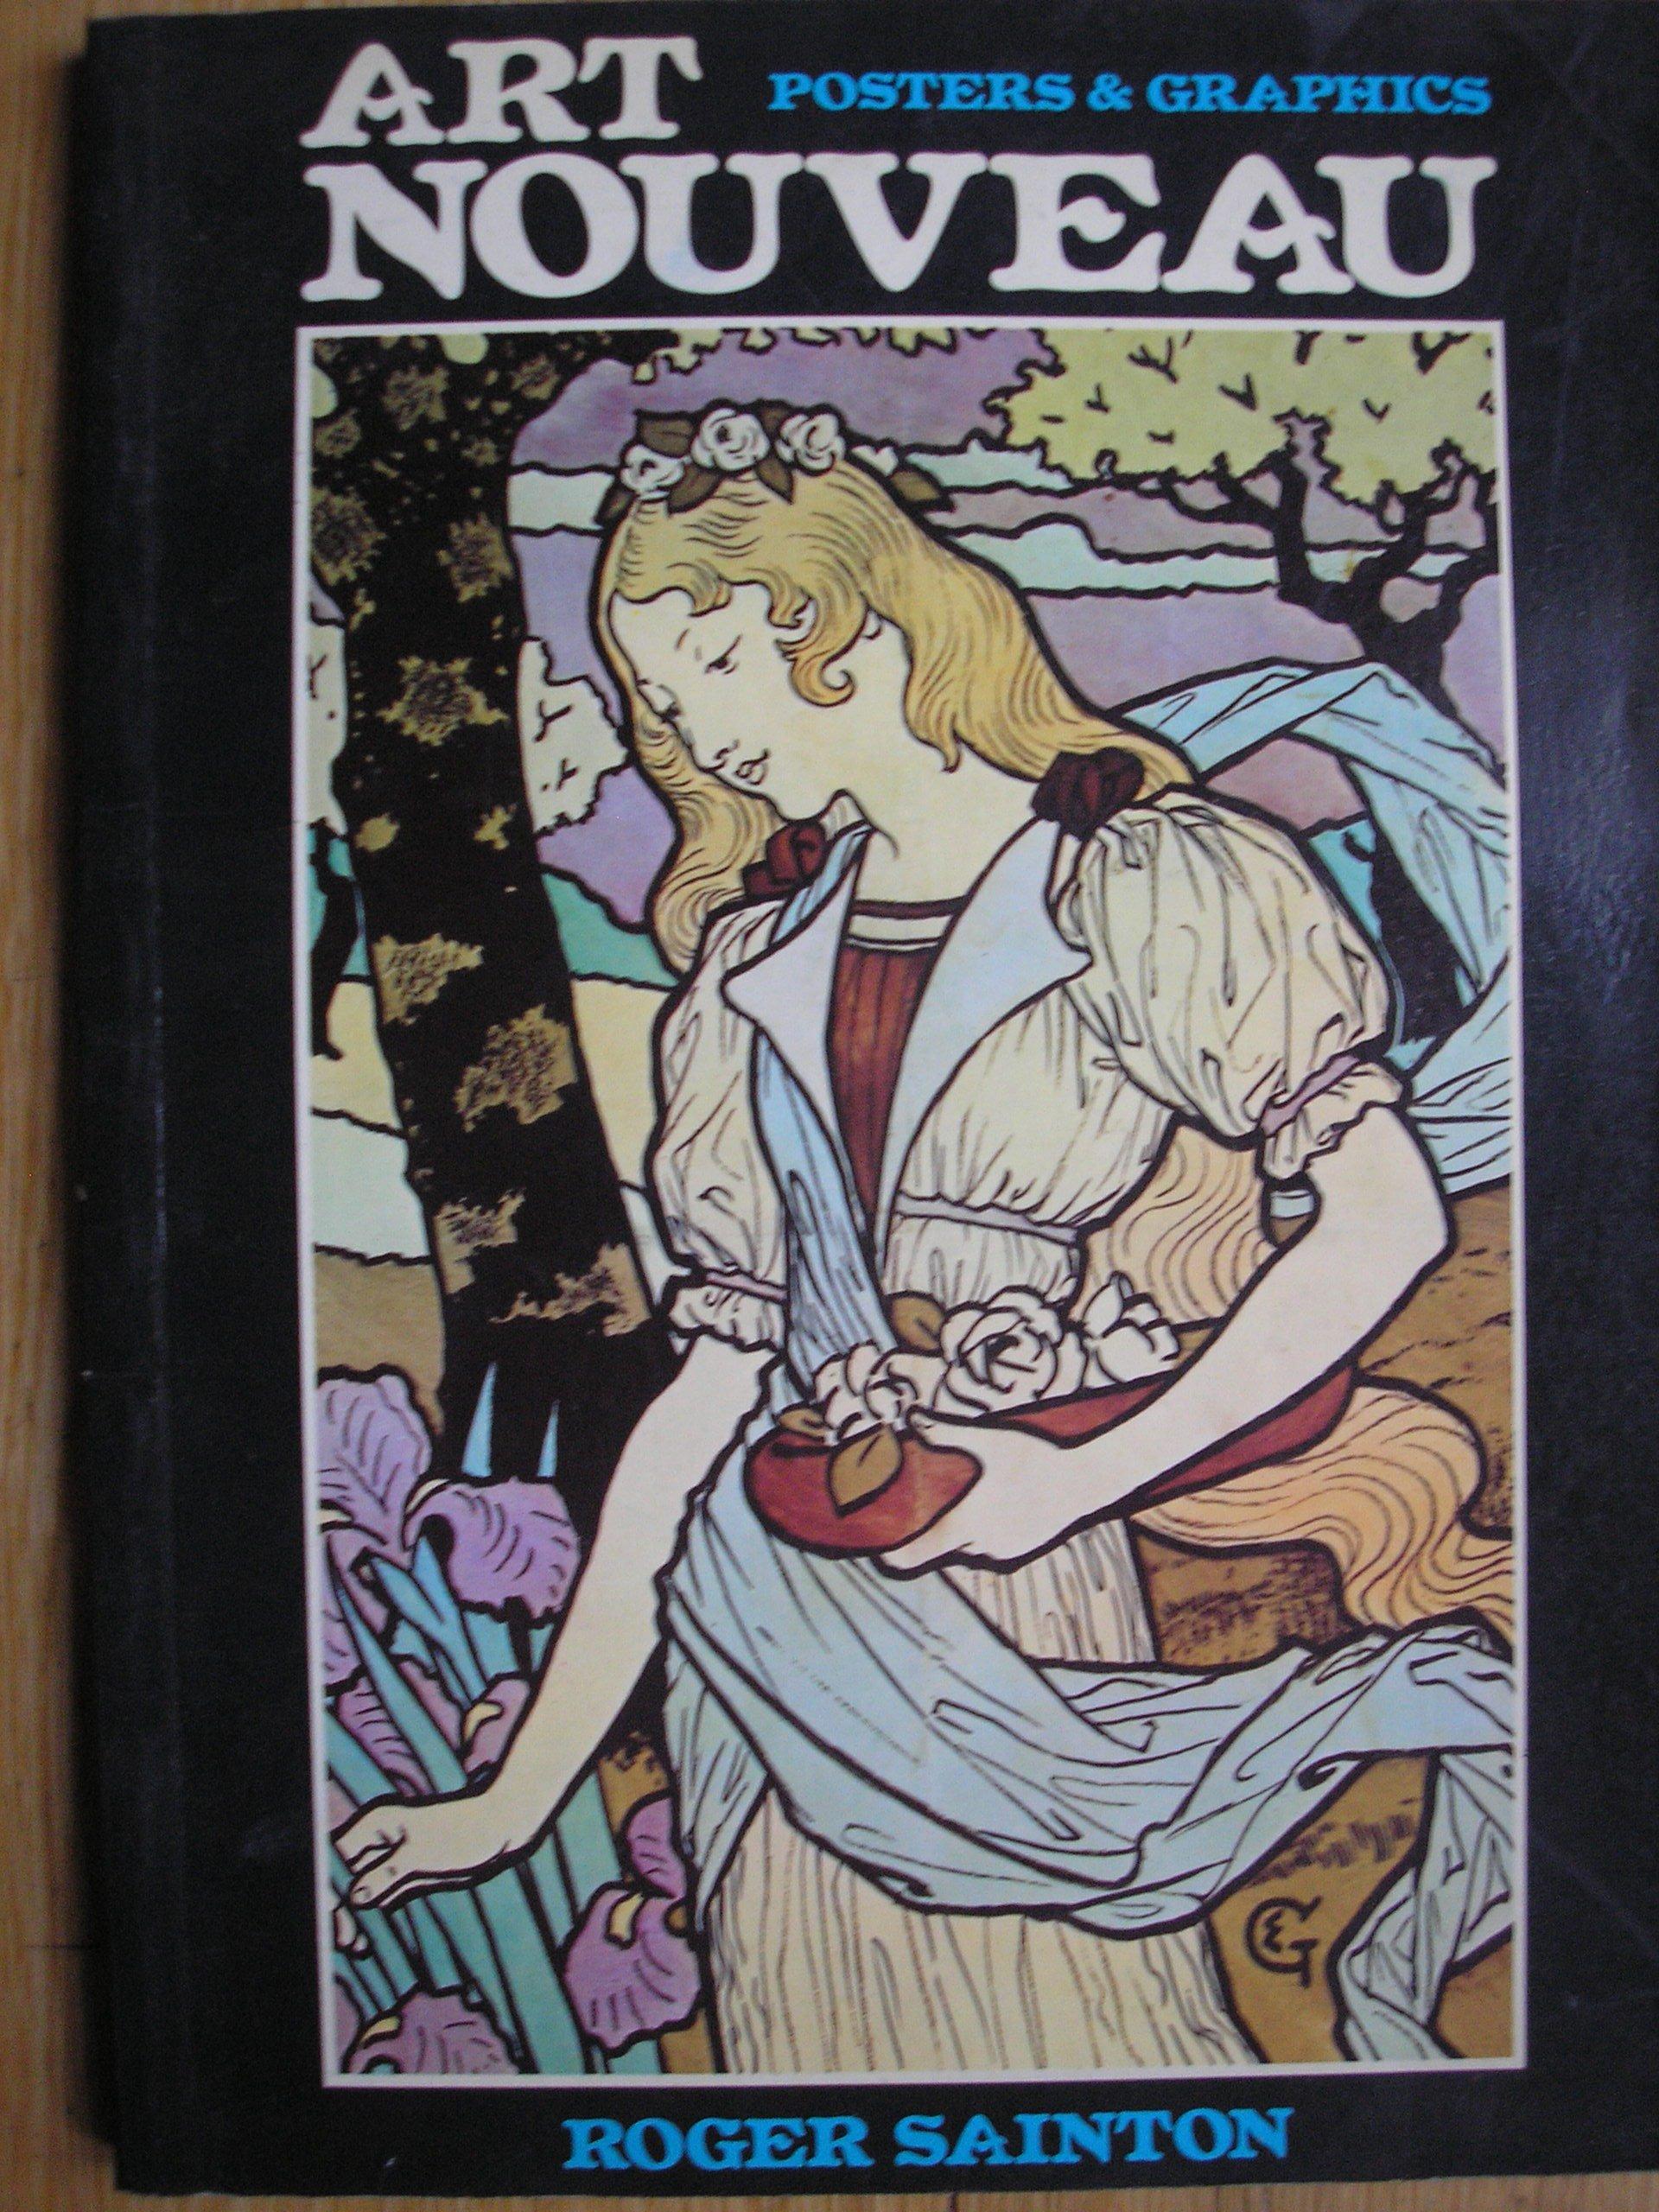 Art Nouveau: Posters and Graphics